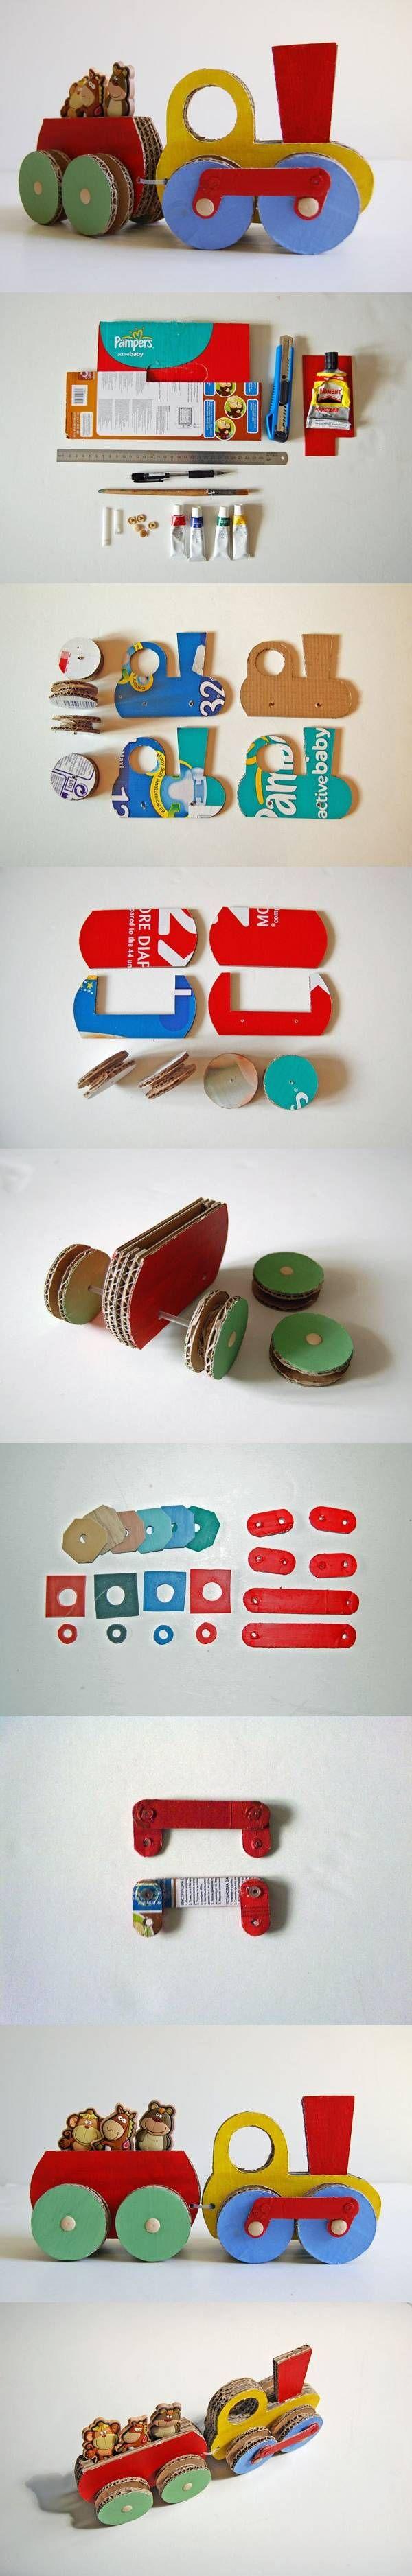 DIY Cardboard Train DIY Projects | UsefulDIY.com